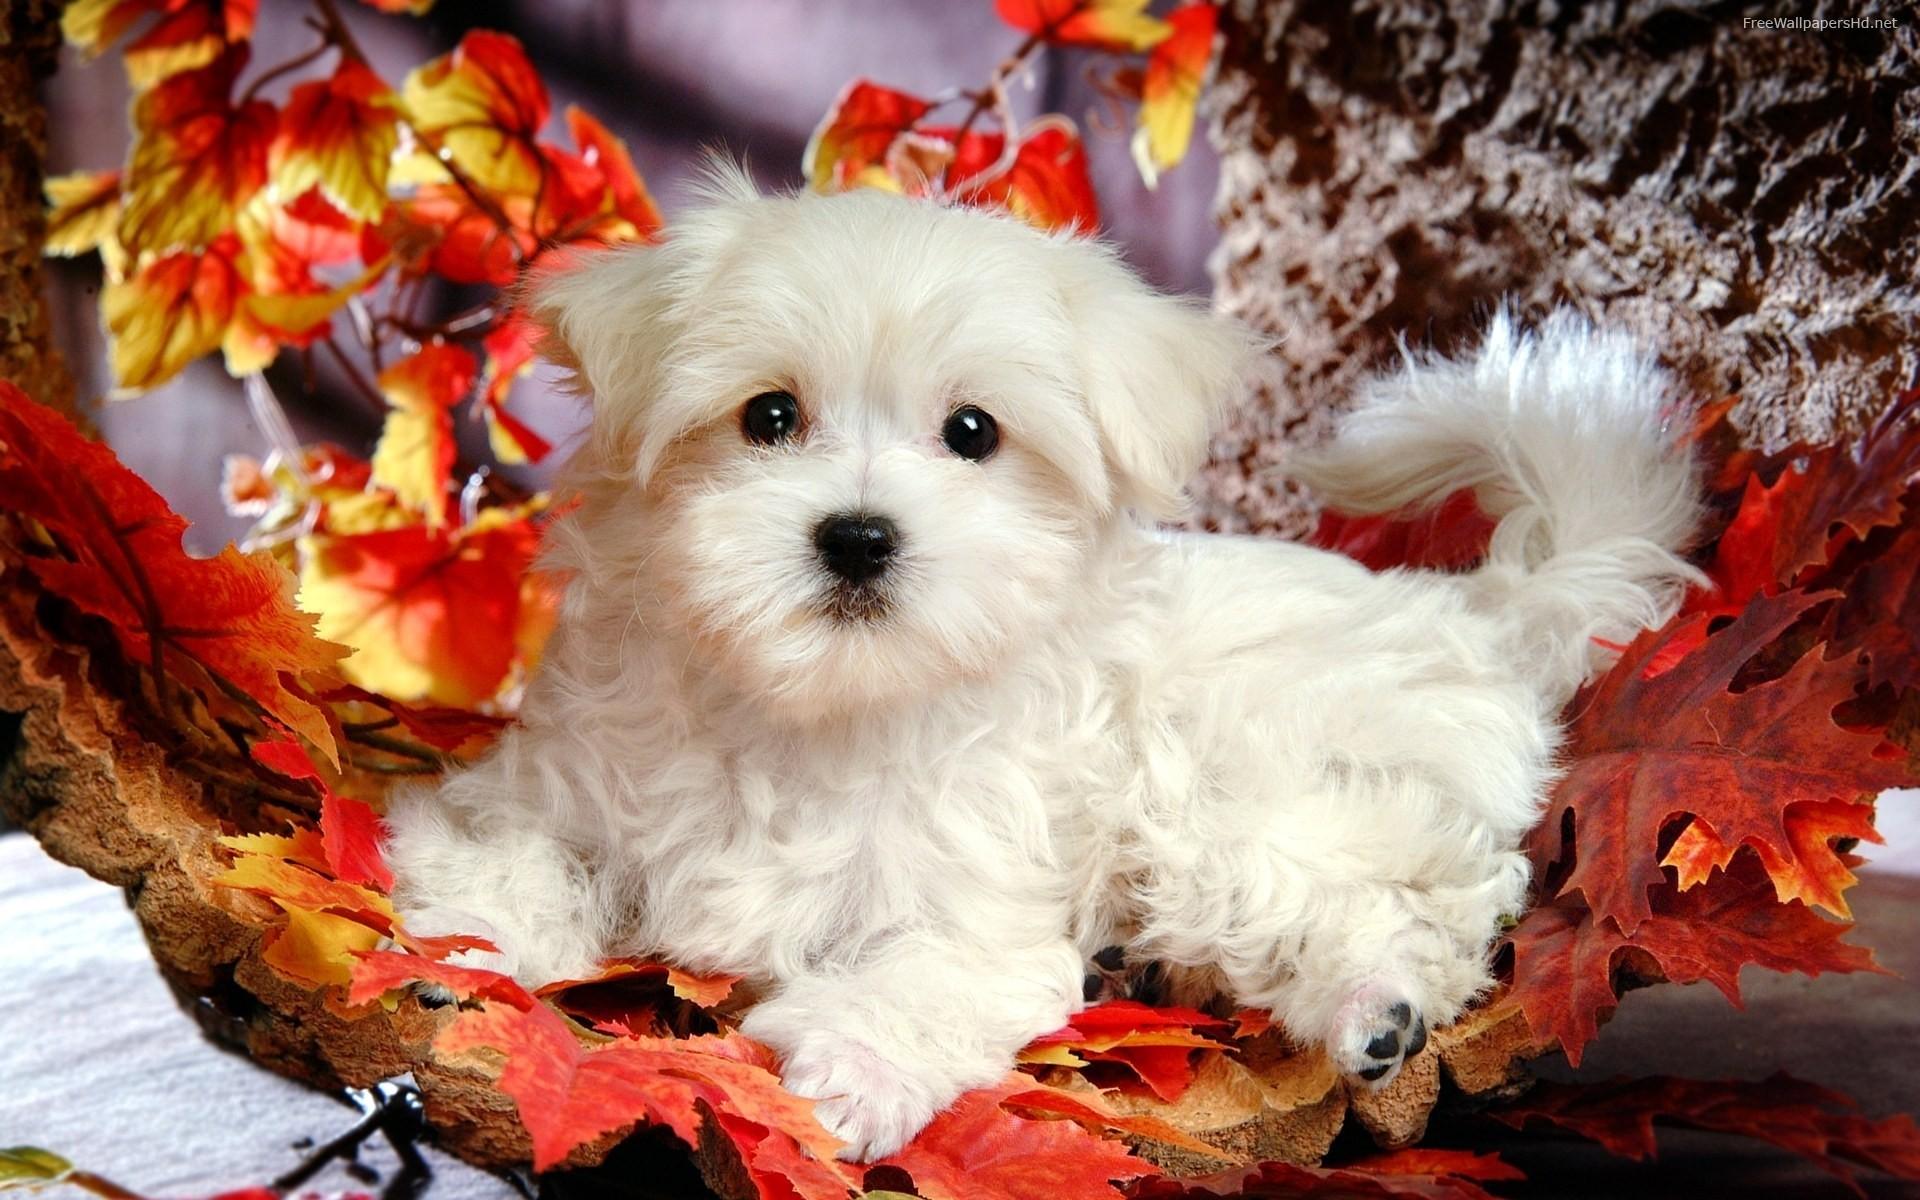 Cute white puppy wallpaper download